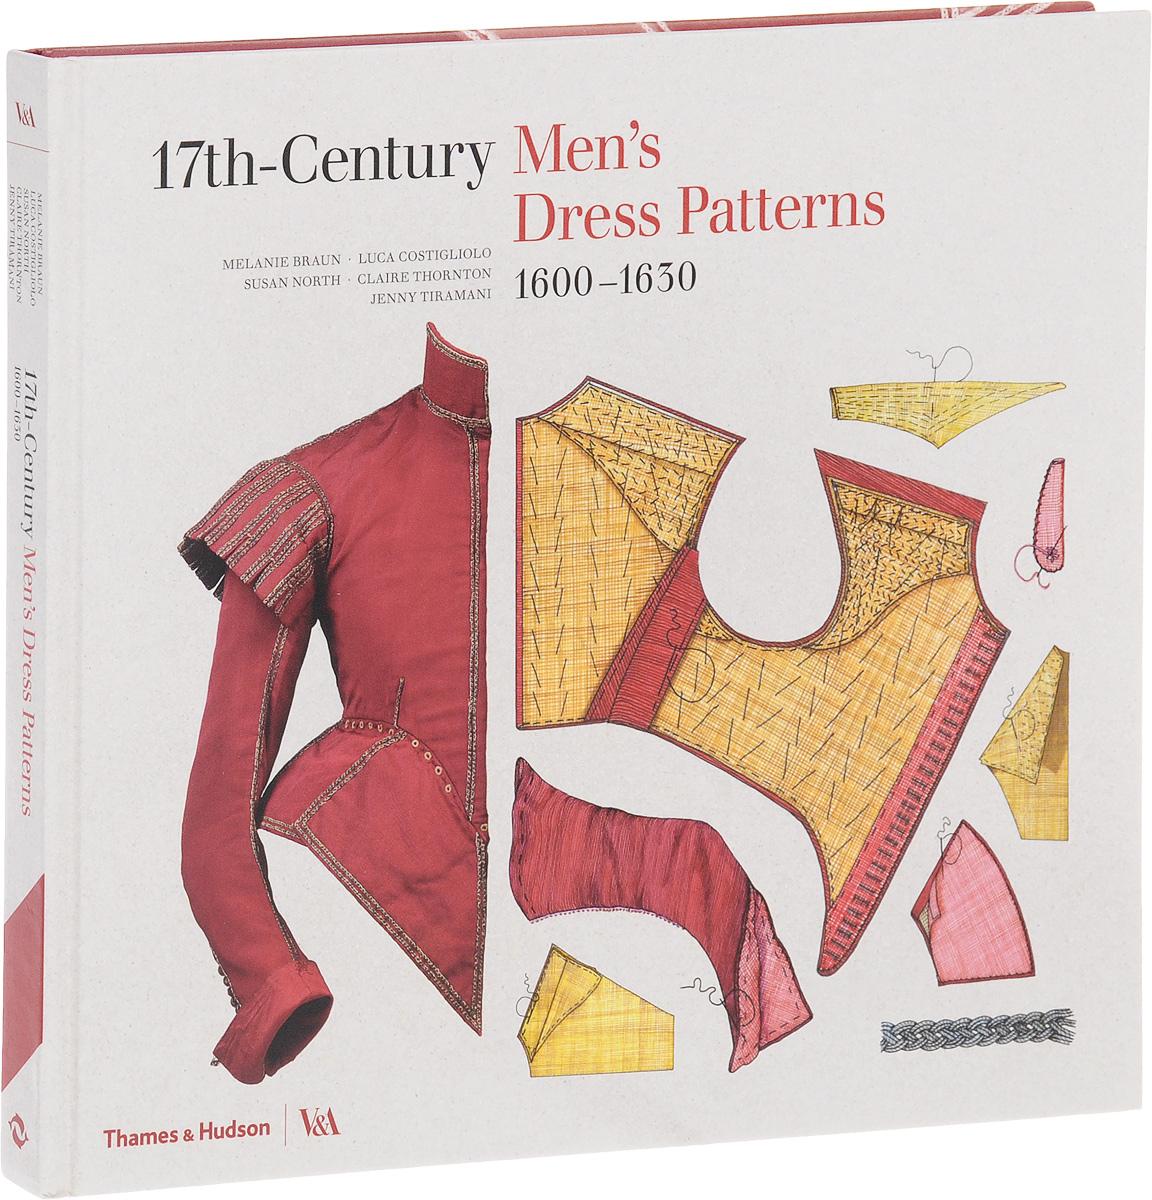 17th-Century Men's Dress Patterns: 1600-1630 dress to the floor color beige